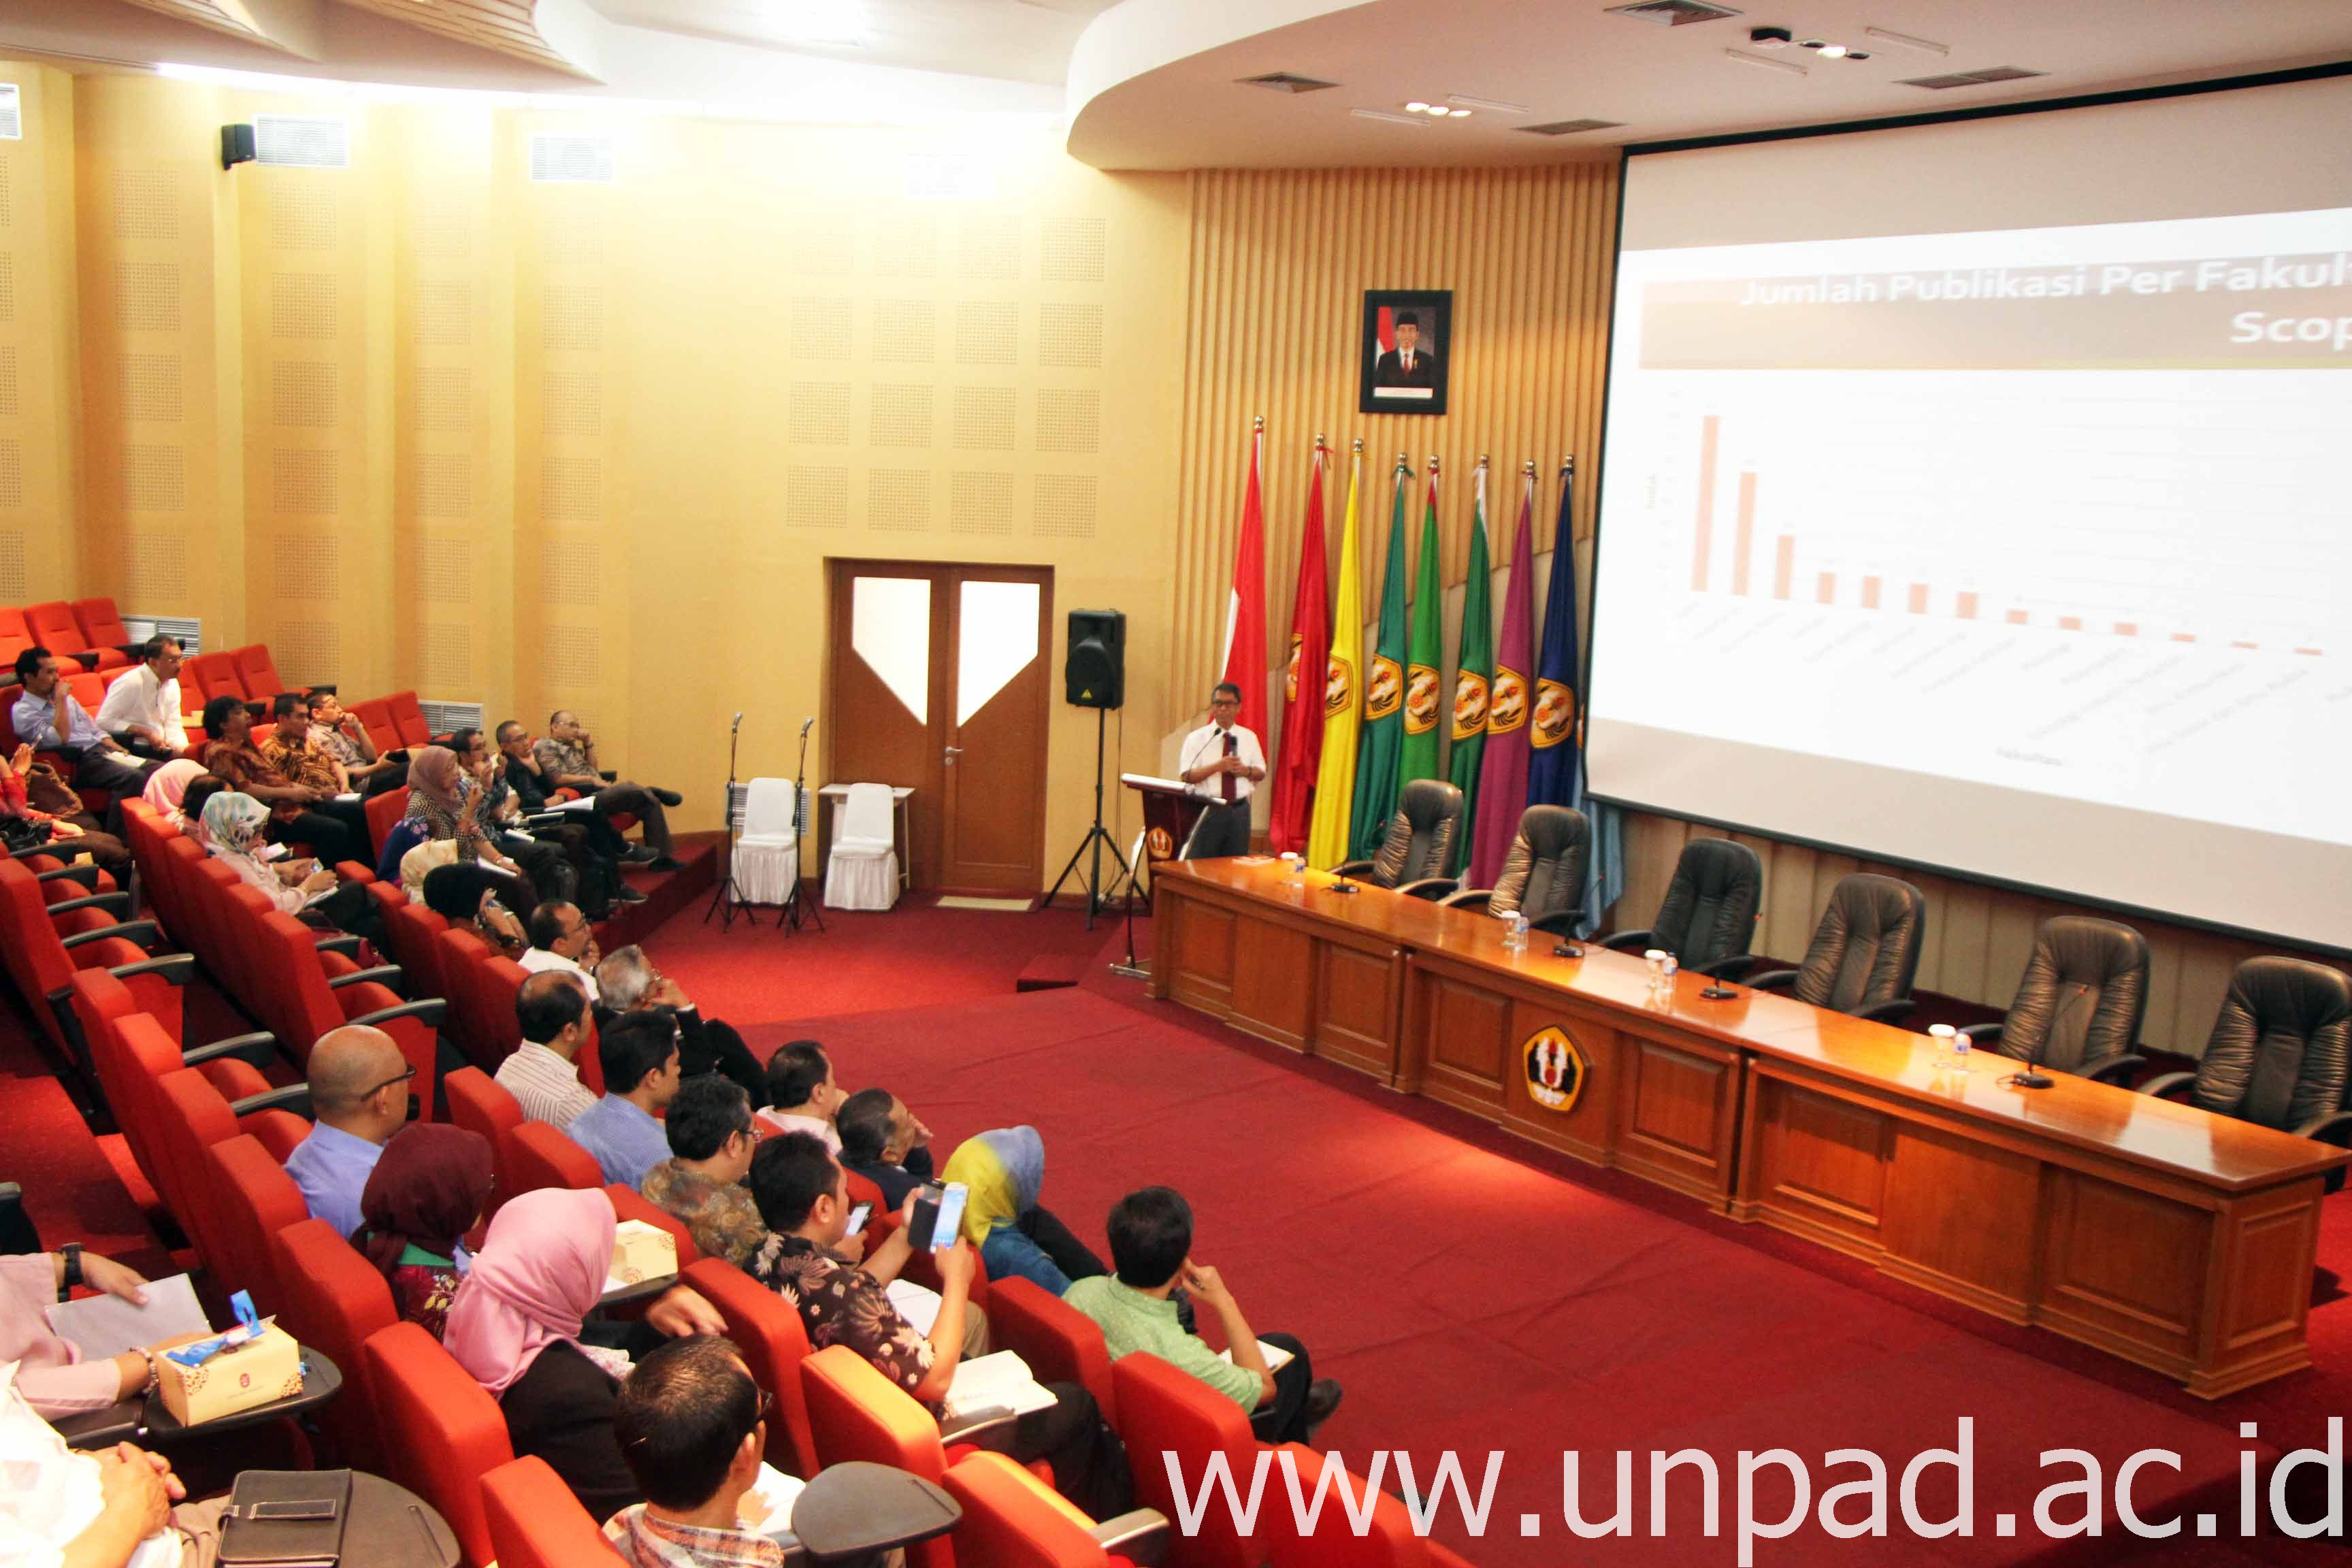 Suasana Sosialisasi Hibah Internal Unpad di Bale Sawala Gedung Rektorat Unpad Kampus Jatinangor, Rabu (28/12). (Foto: Tedi Yusup)*